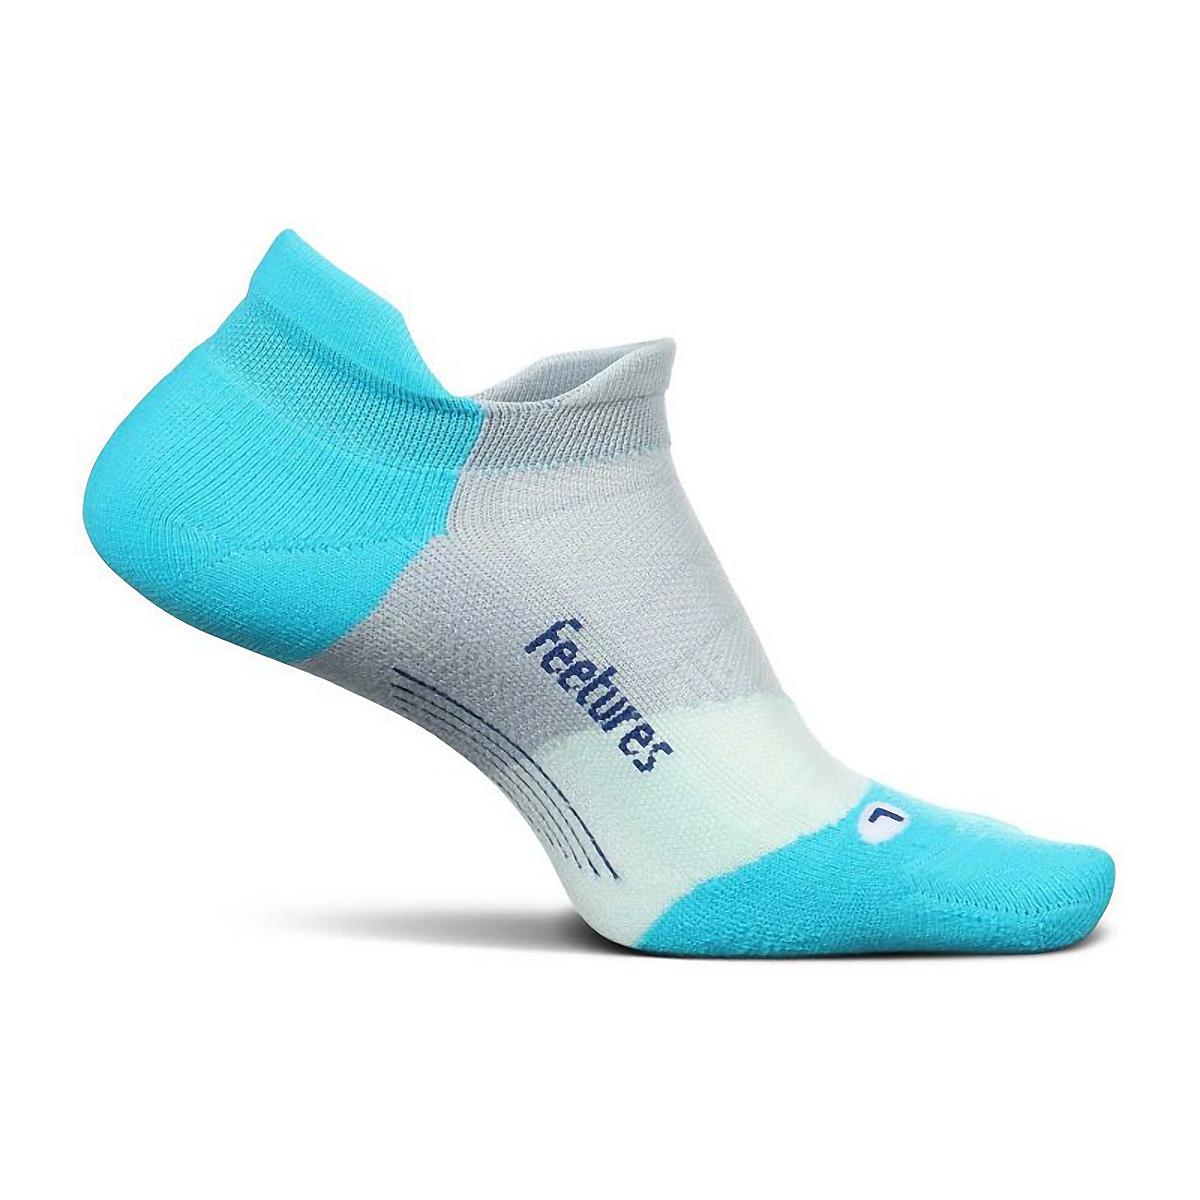 Feetures Elite Light Cushion No Show Sock - Color: A.I. Aqua - Size: S, A.I. Aqua, large, image 1